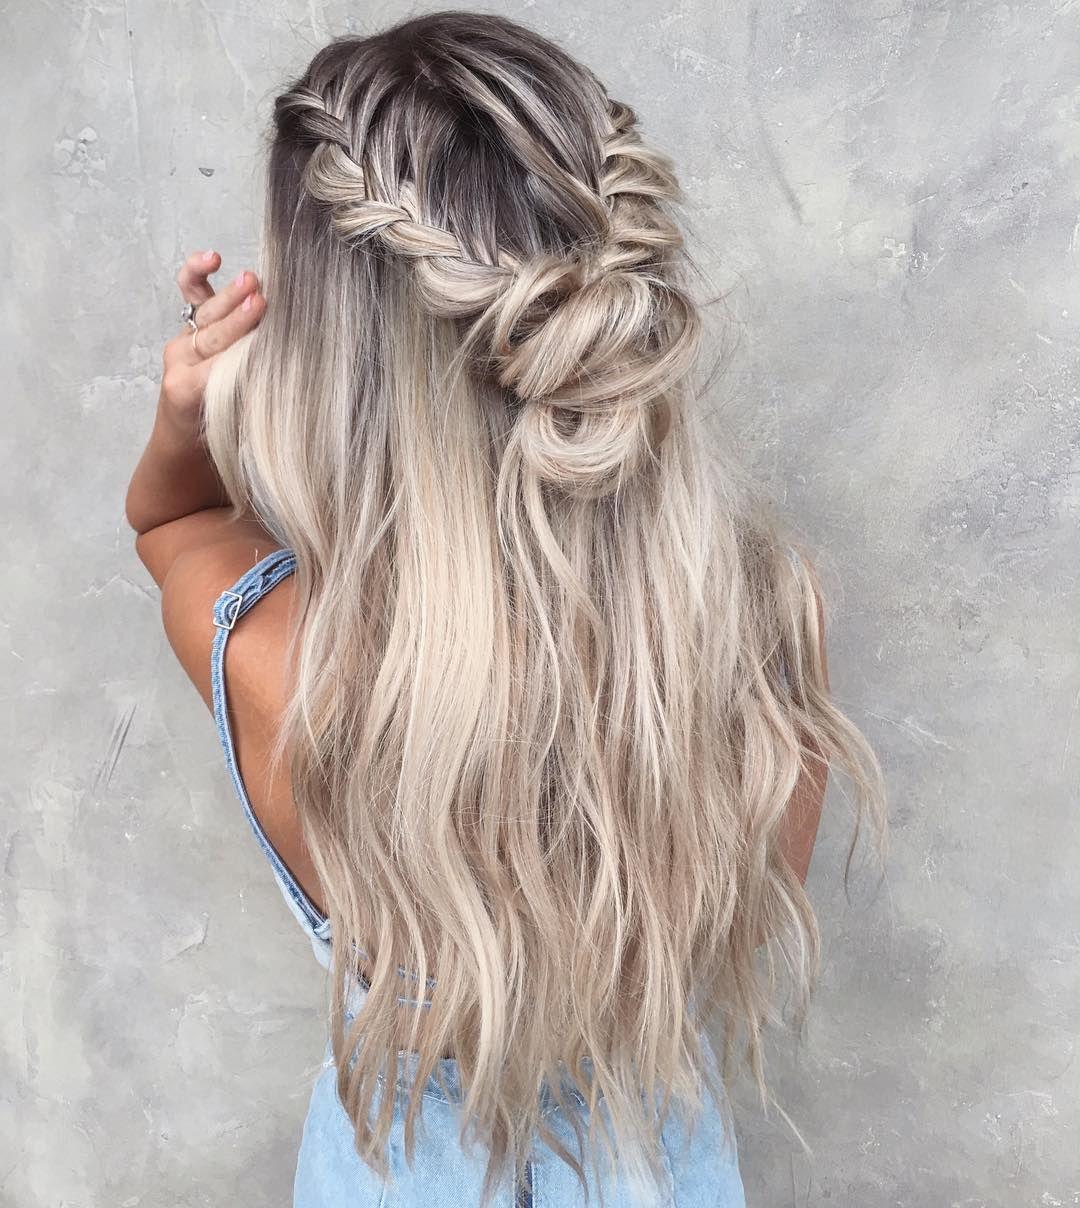 Hair Inspiration 2019-04-15 22:07:52